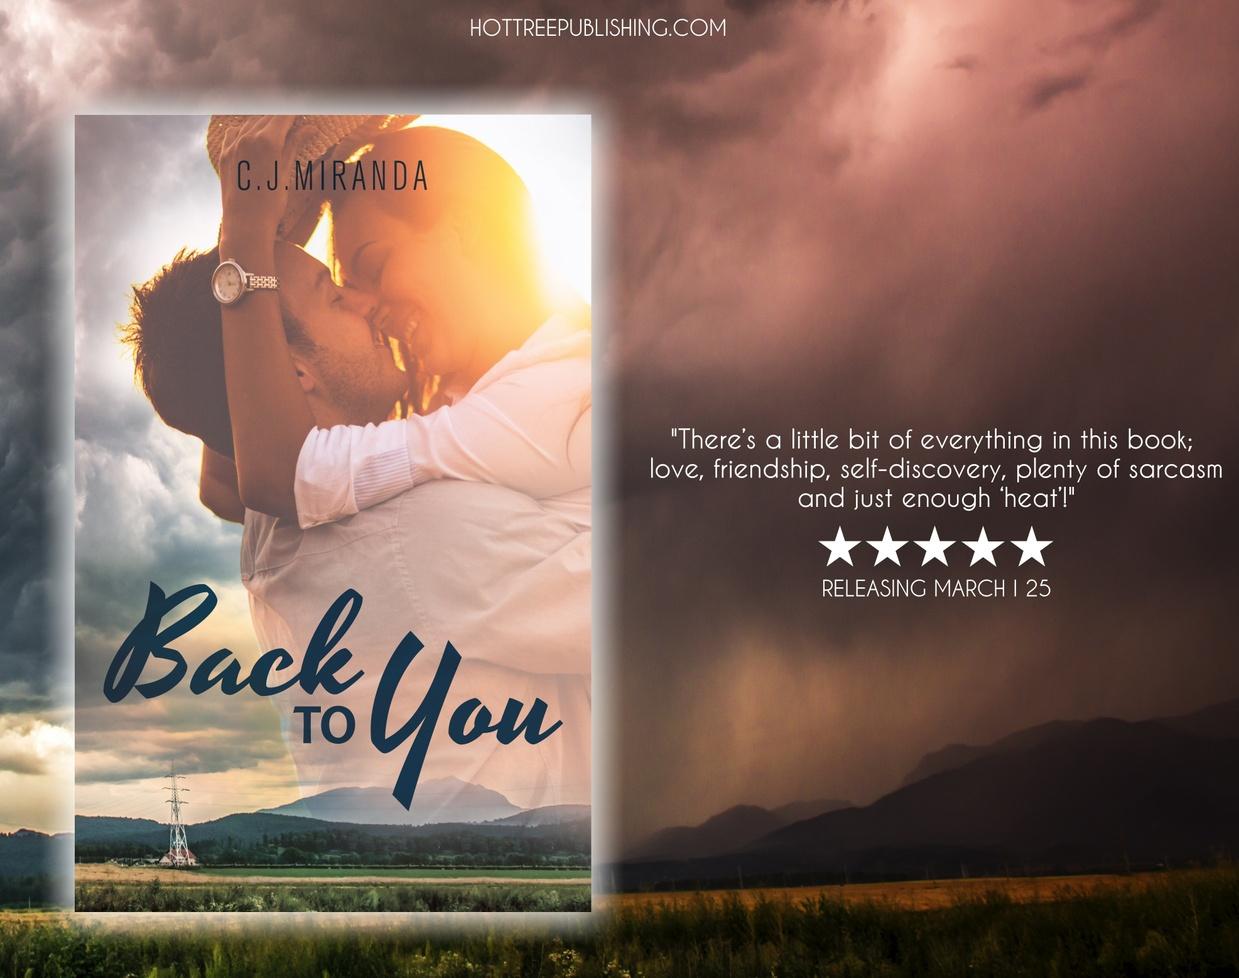 Epub Back to You by CJ Miranda